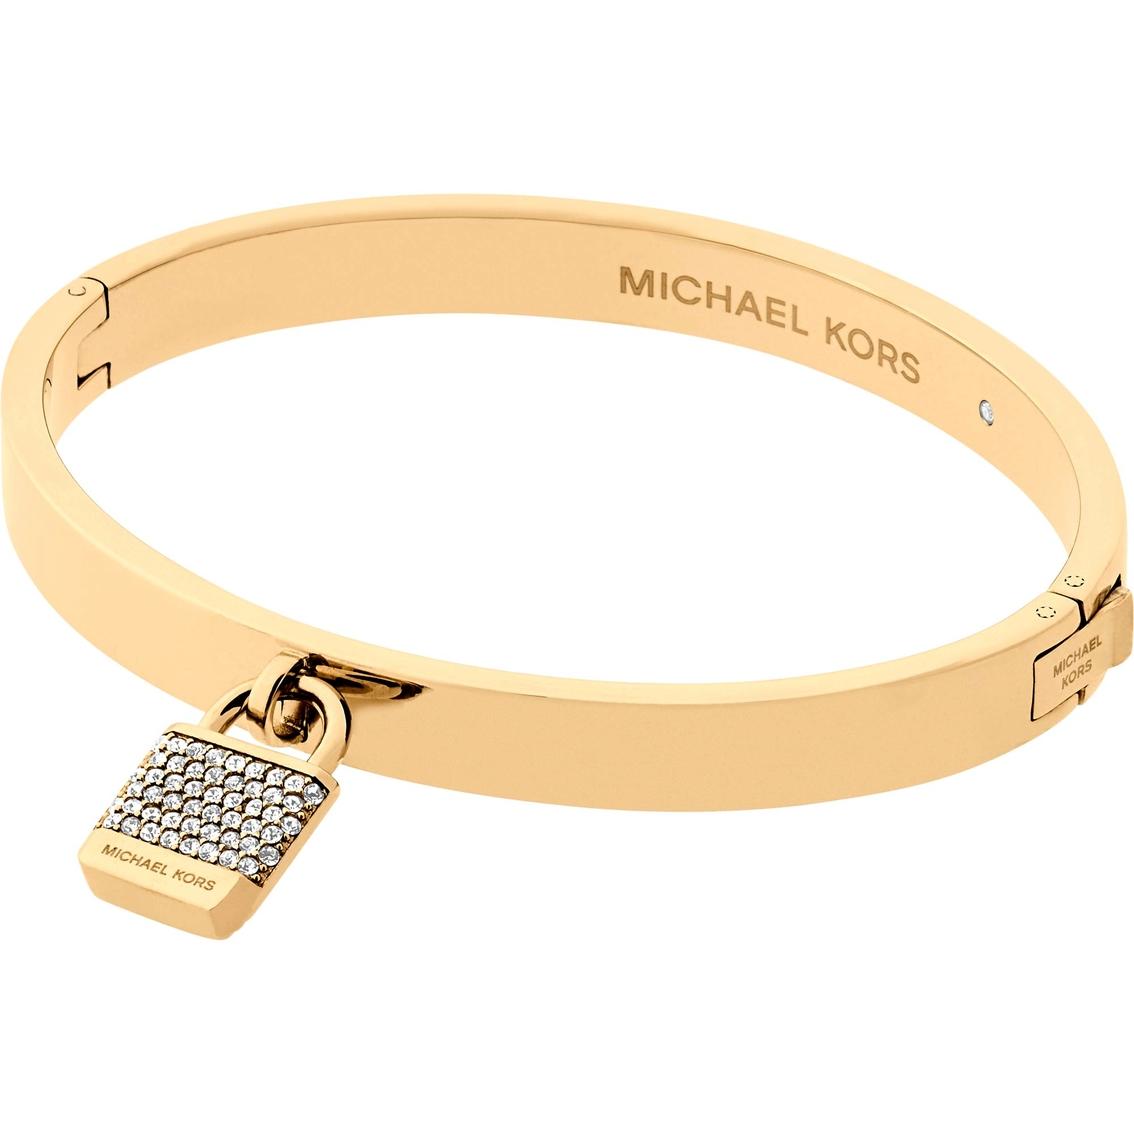 428b64453a8ac Michael Kors Haute Hardware Logo Goldtone and Pave Padlock Hinged Bangle  Bracelet